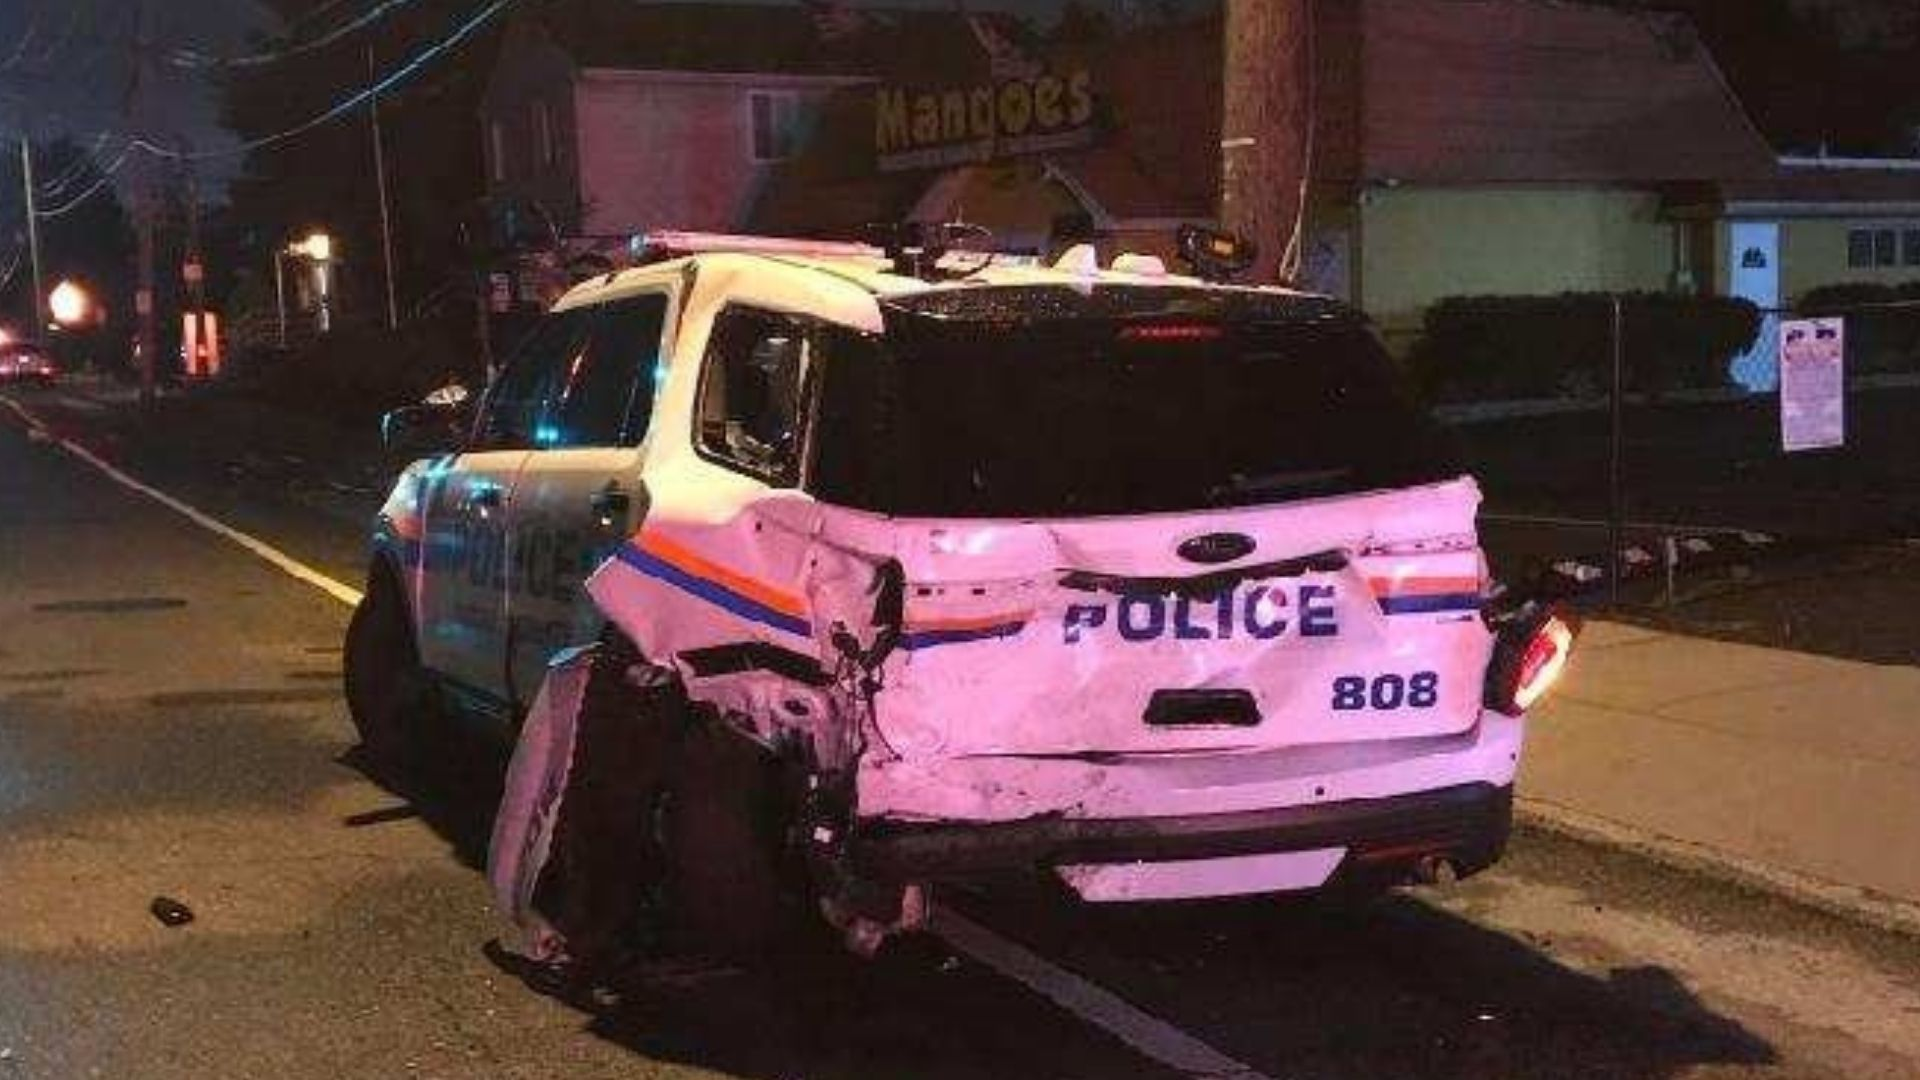 LI police car damage DWI